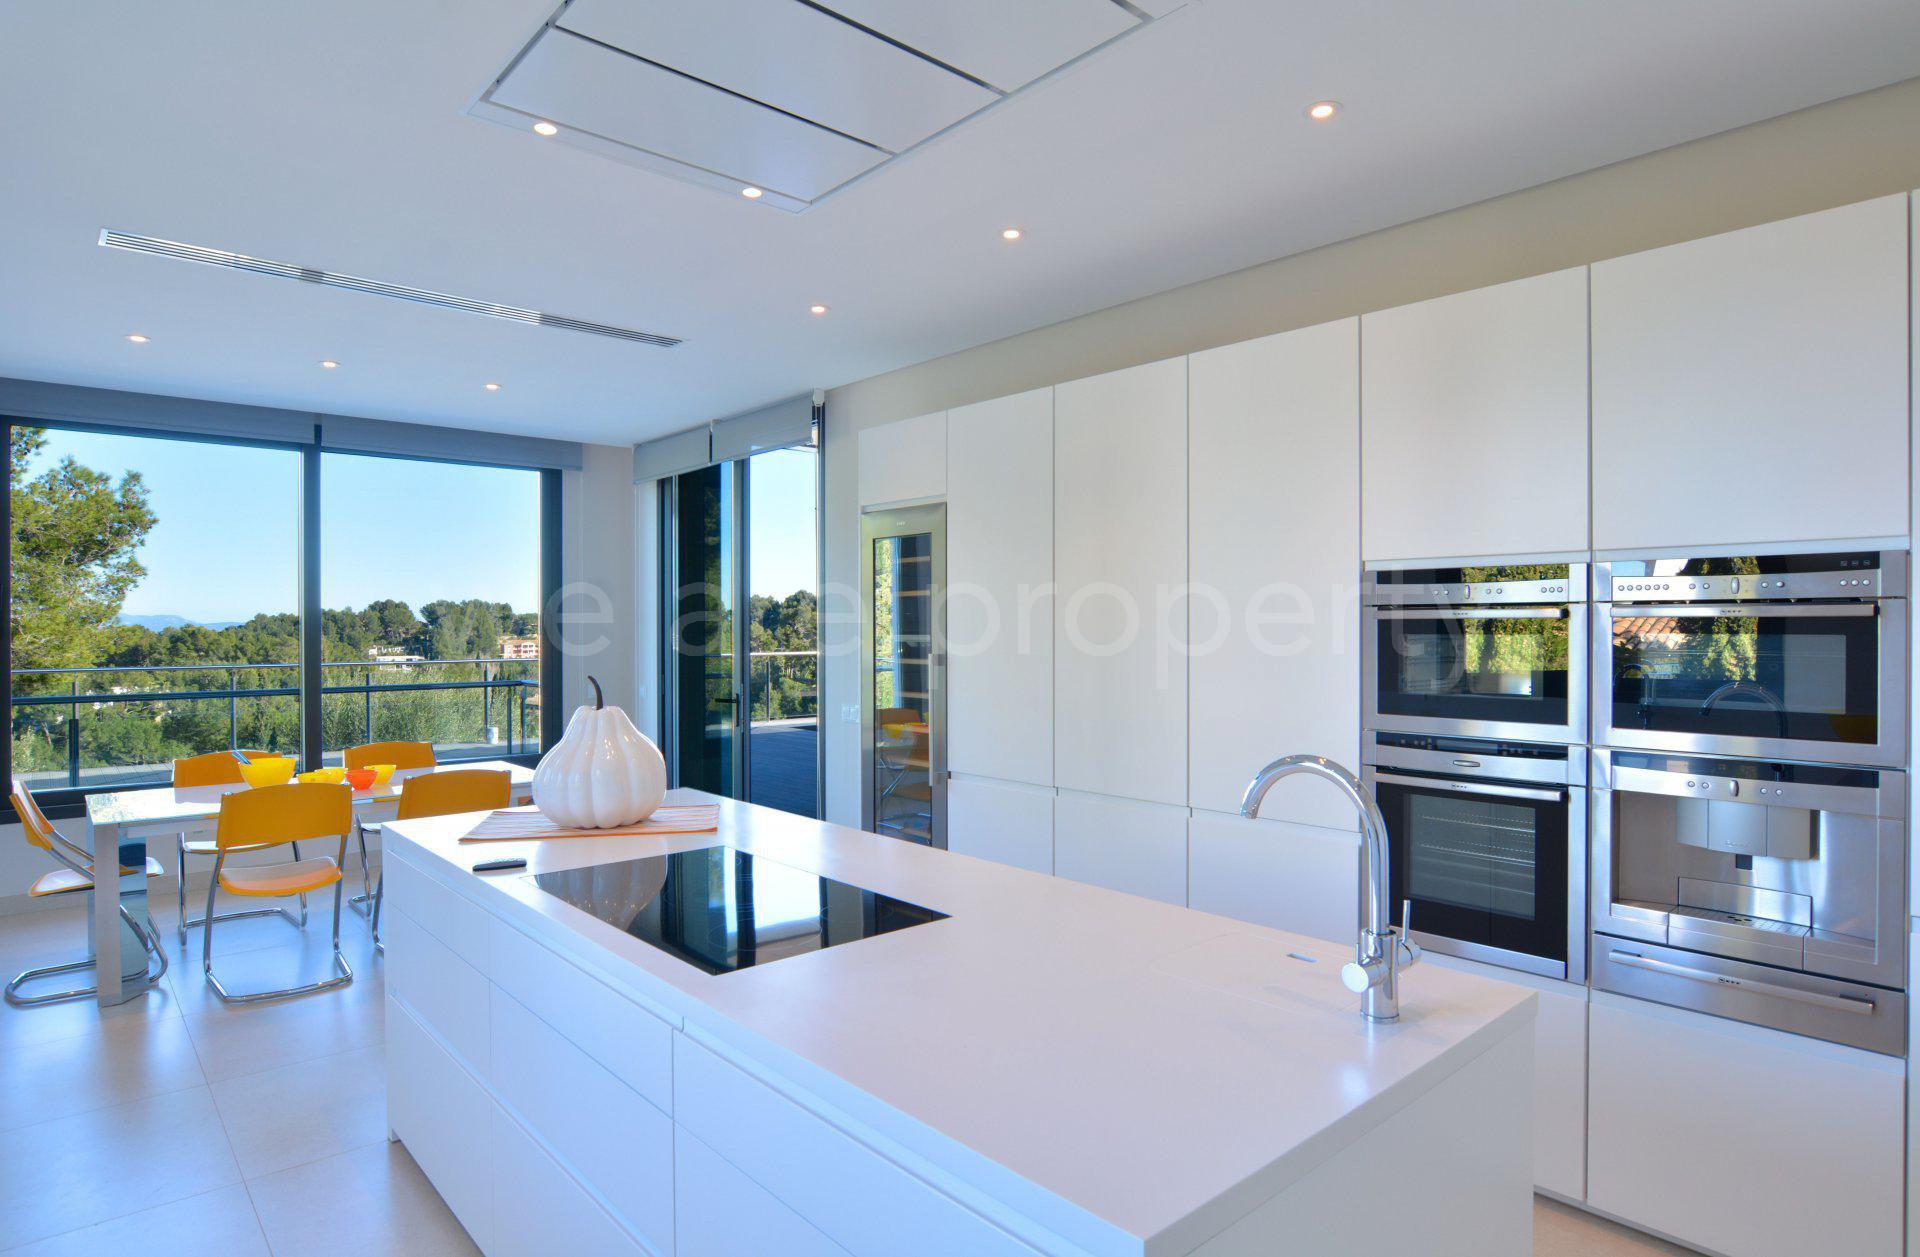 Natural light, stainless steel, kitchen island